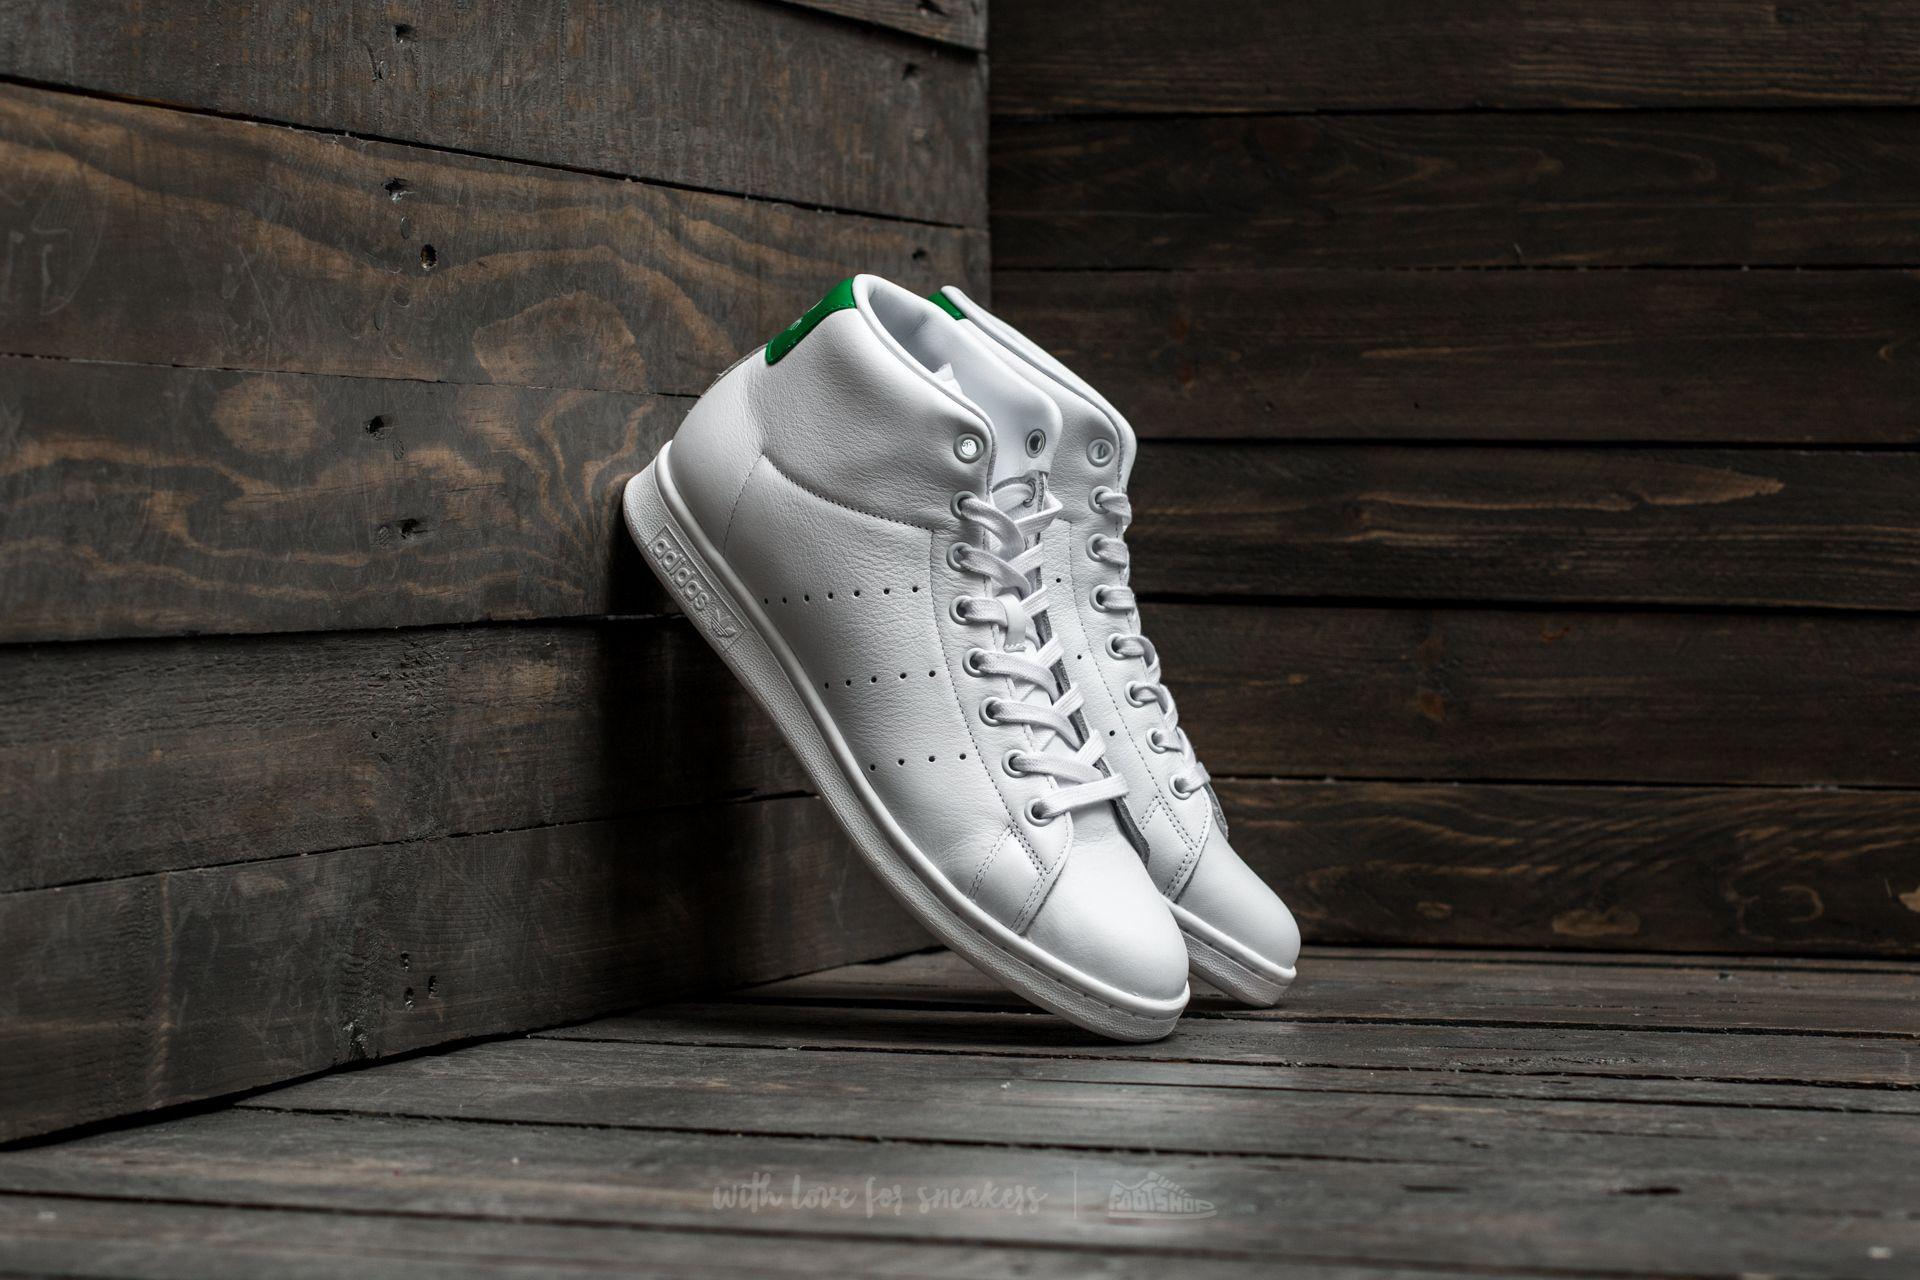 a8898b07471 adidas Stan Smith MID Footwear White  Footwear White  Green ...